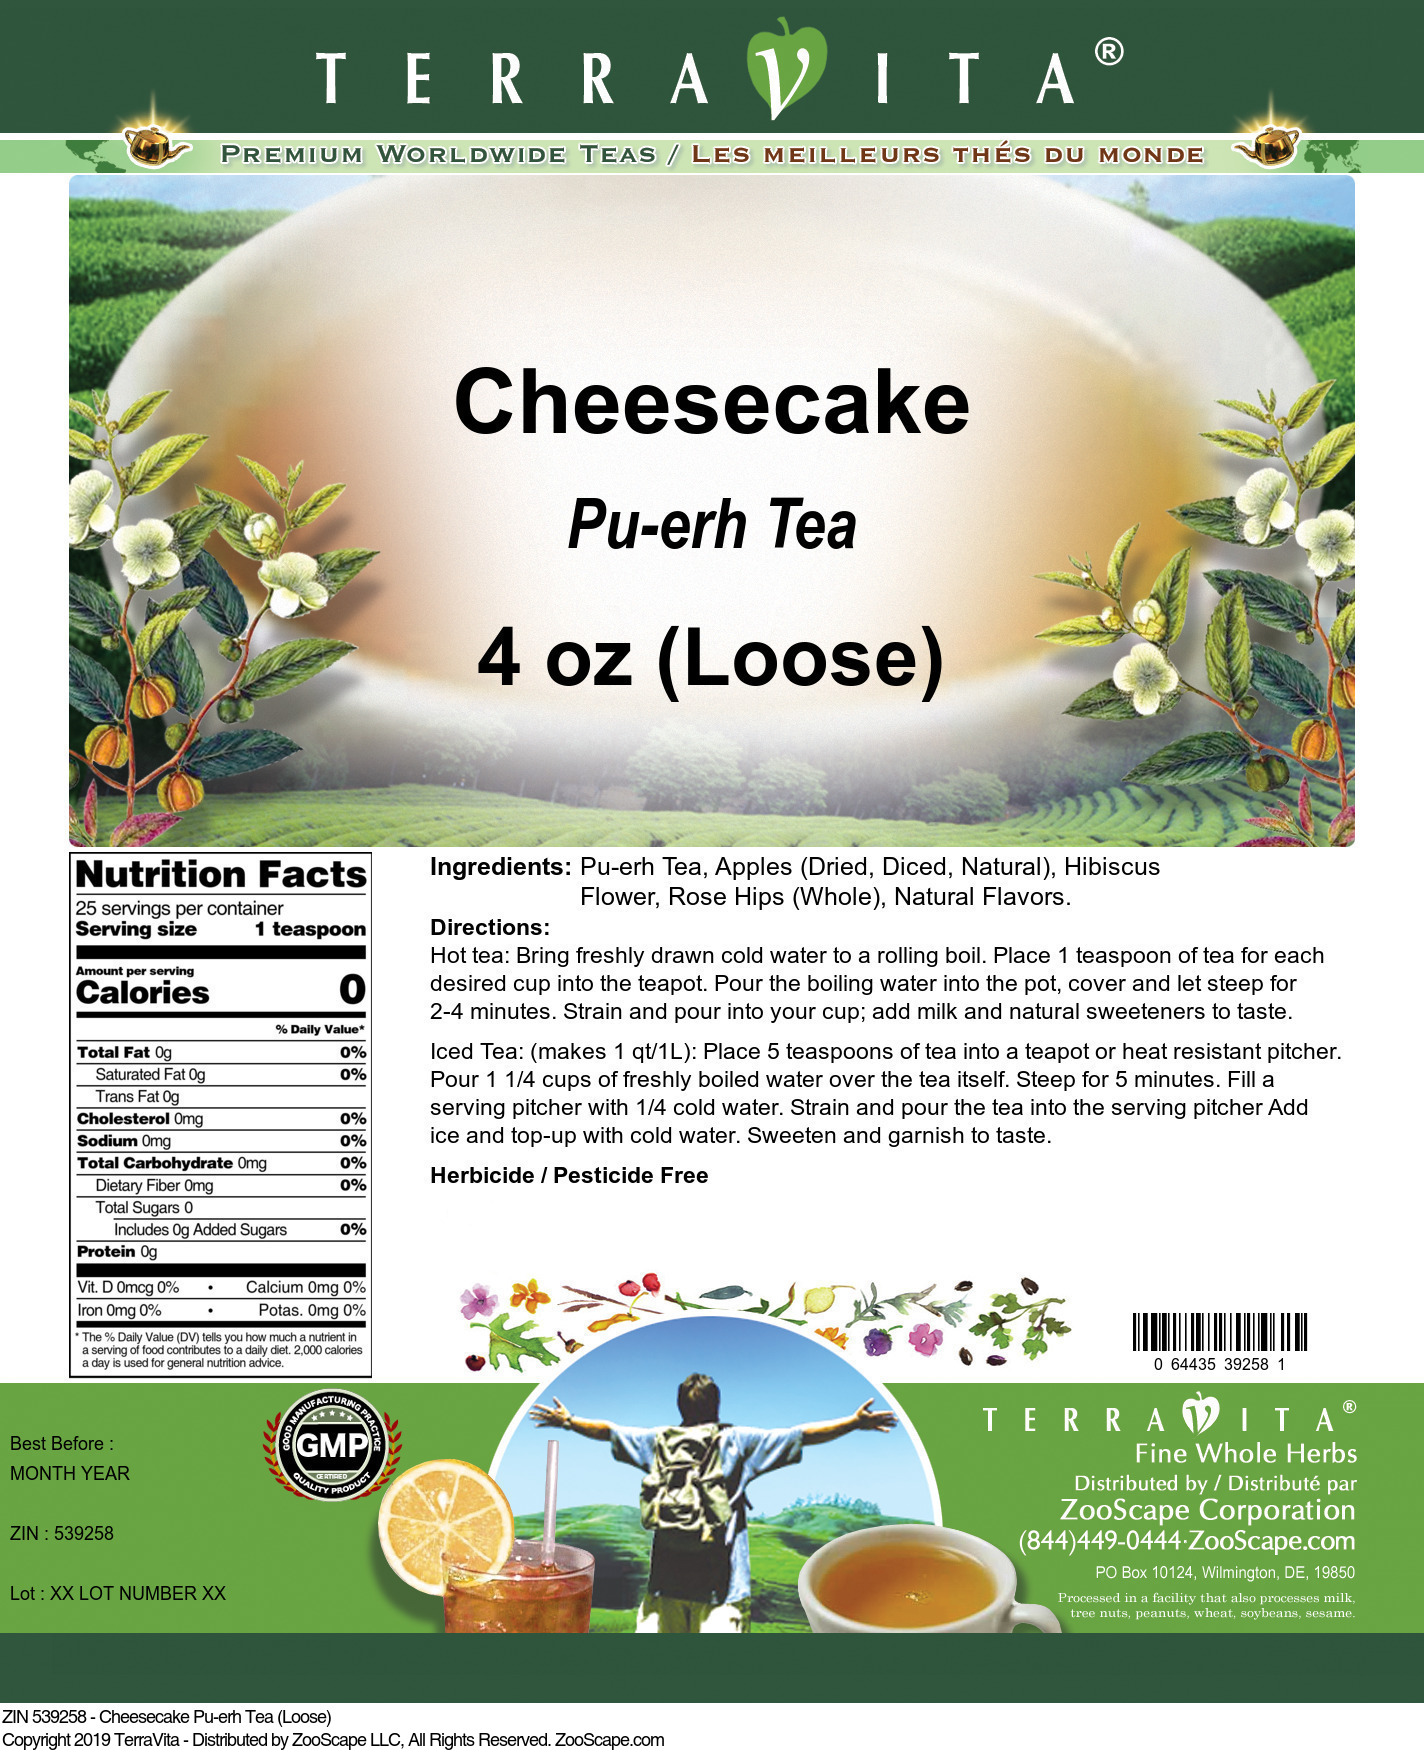 Cheesecake Pu-erh Tea (Loose)